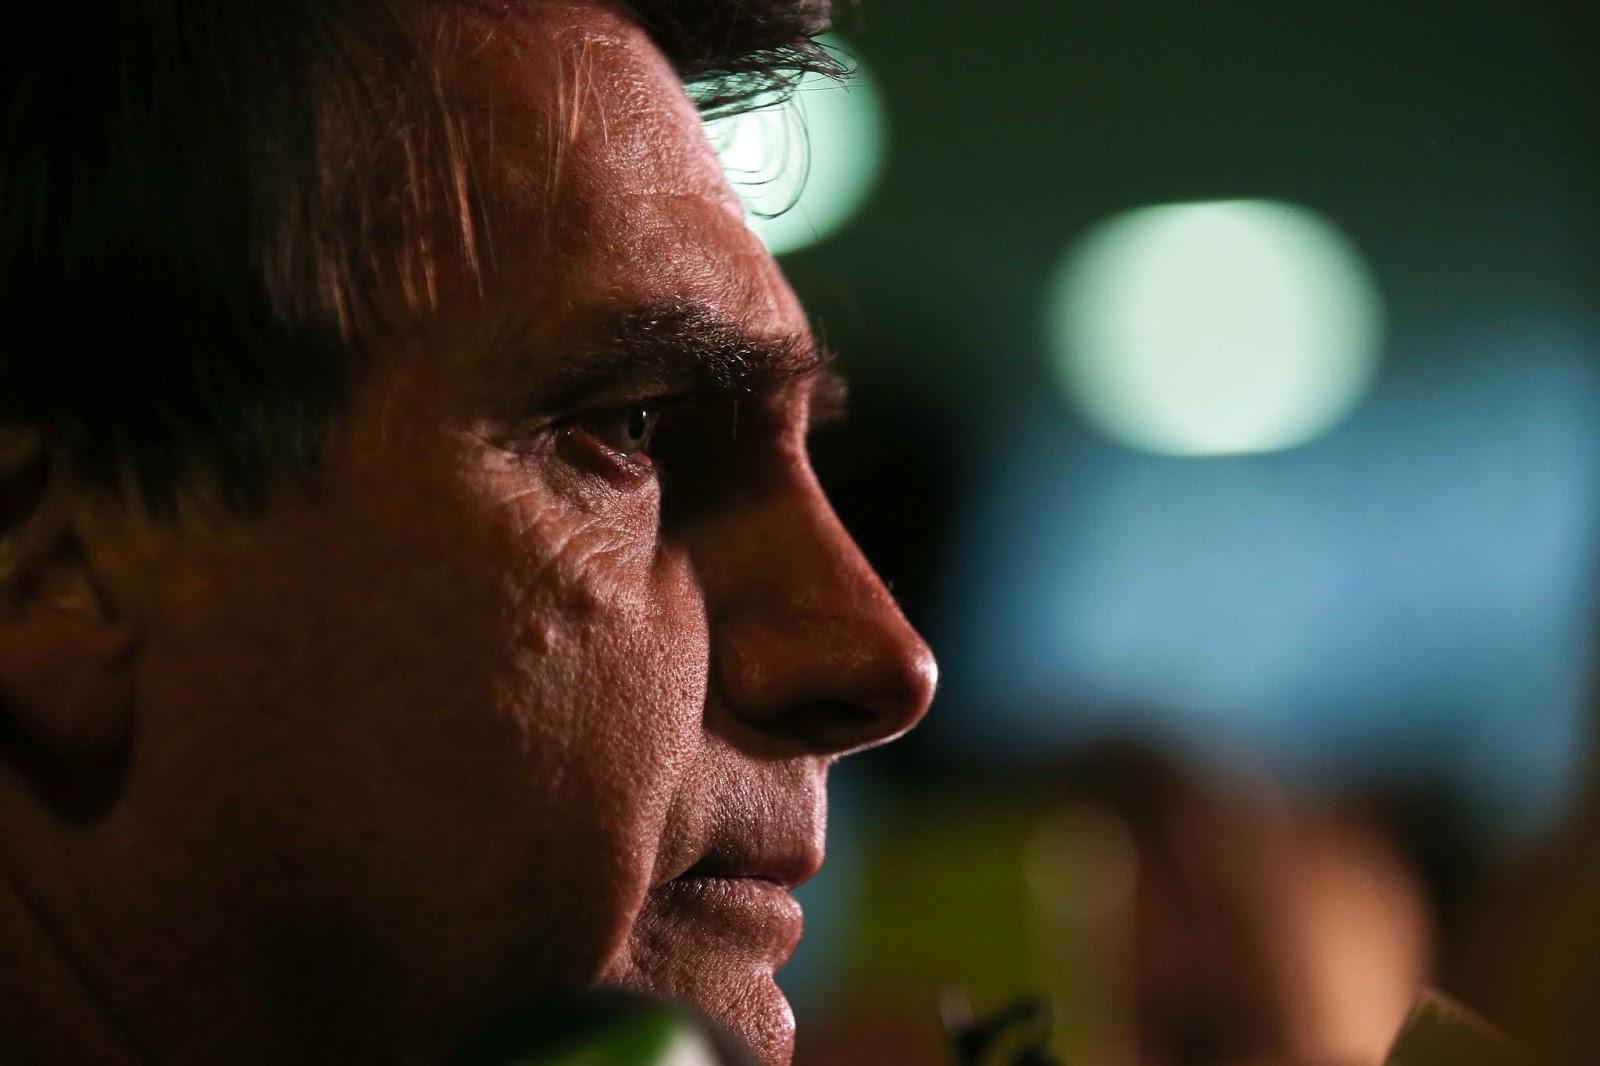 No segundo turno, Bolsonaro perde para Haddad, Ciro e Alckmin, diz Ibope